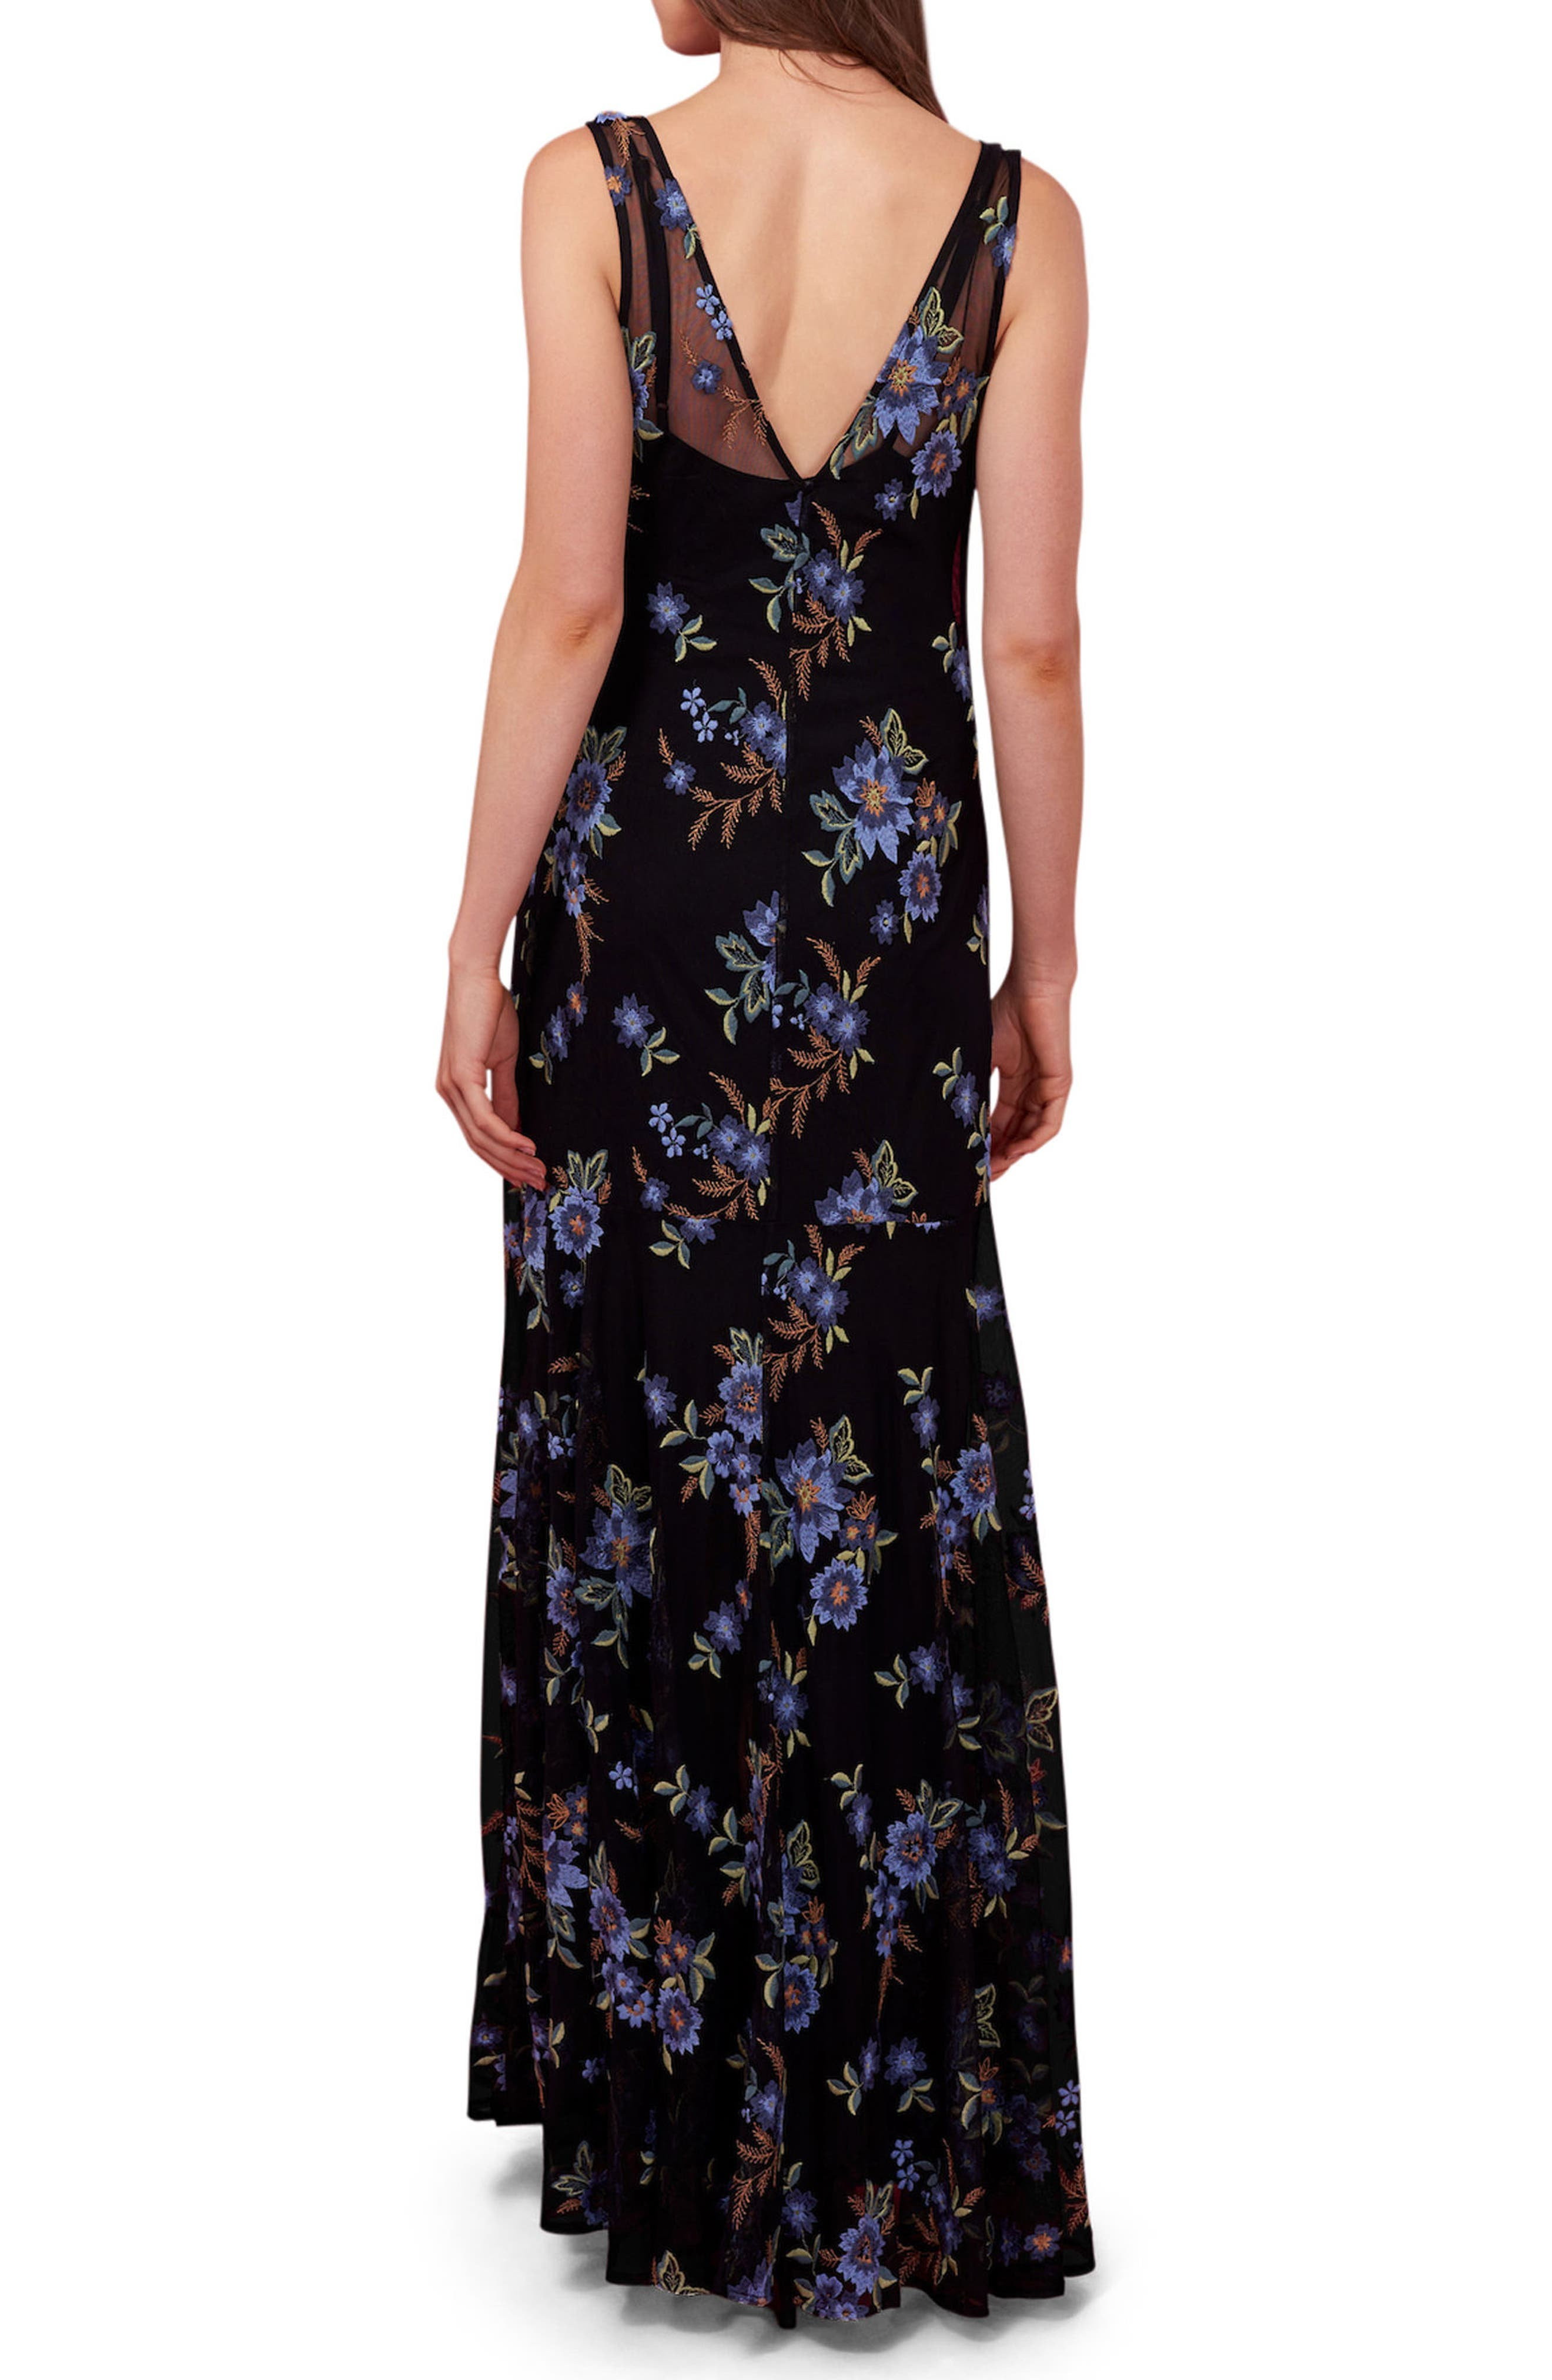 Embroidered Mesh Maxi Dress,                             Alternate thumbnail 2, color,                             Black/ Multi